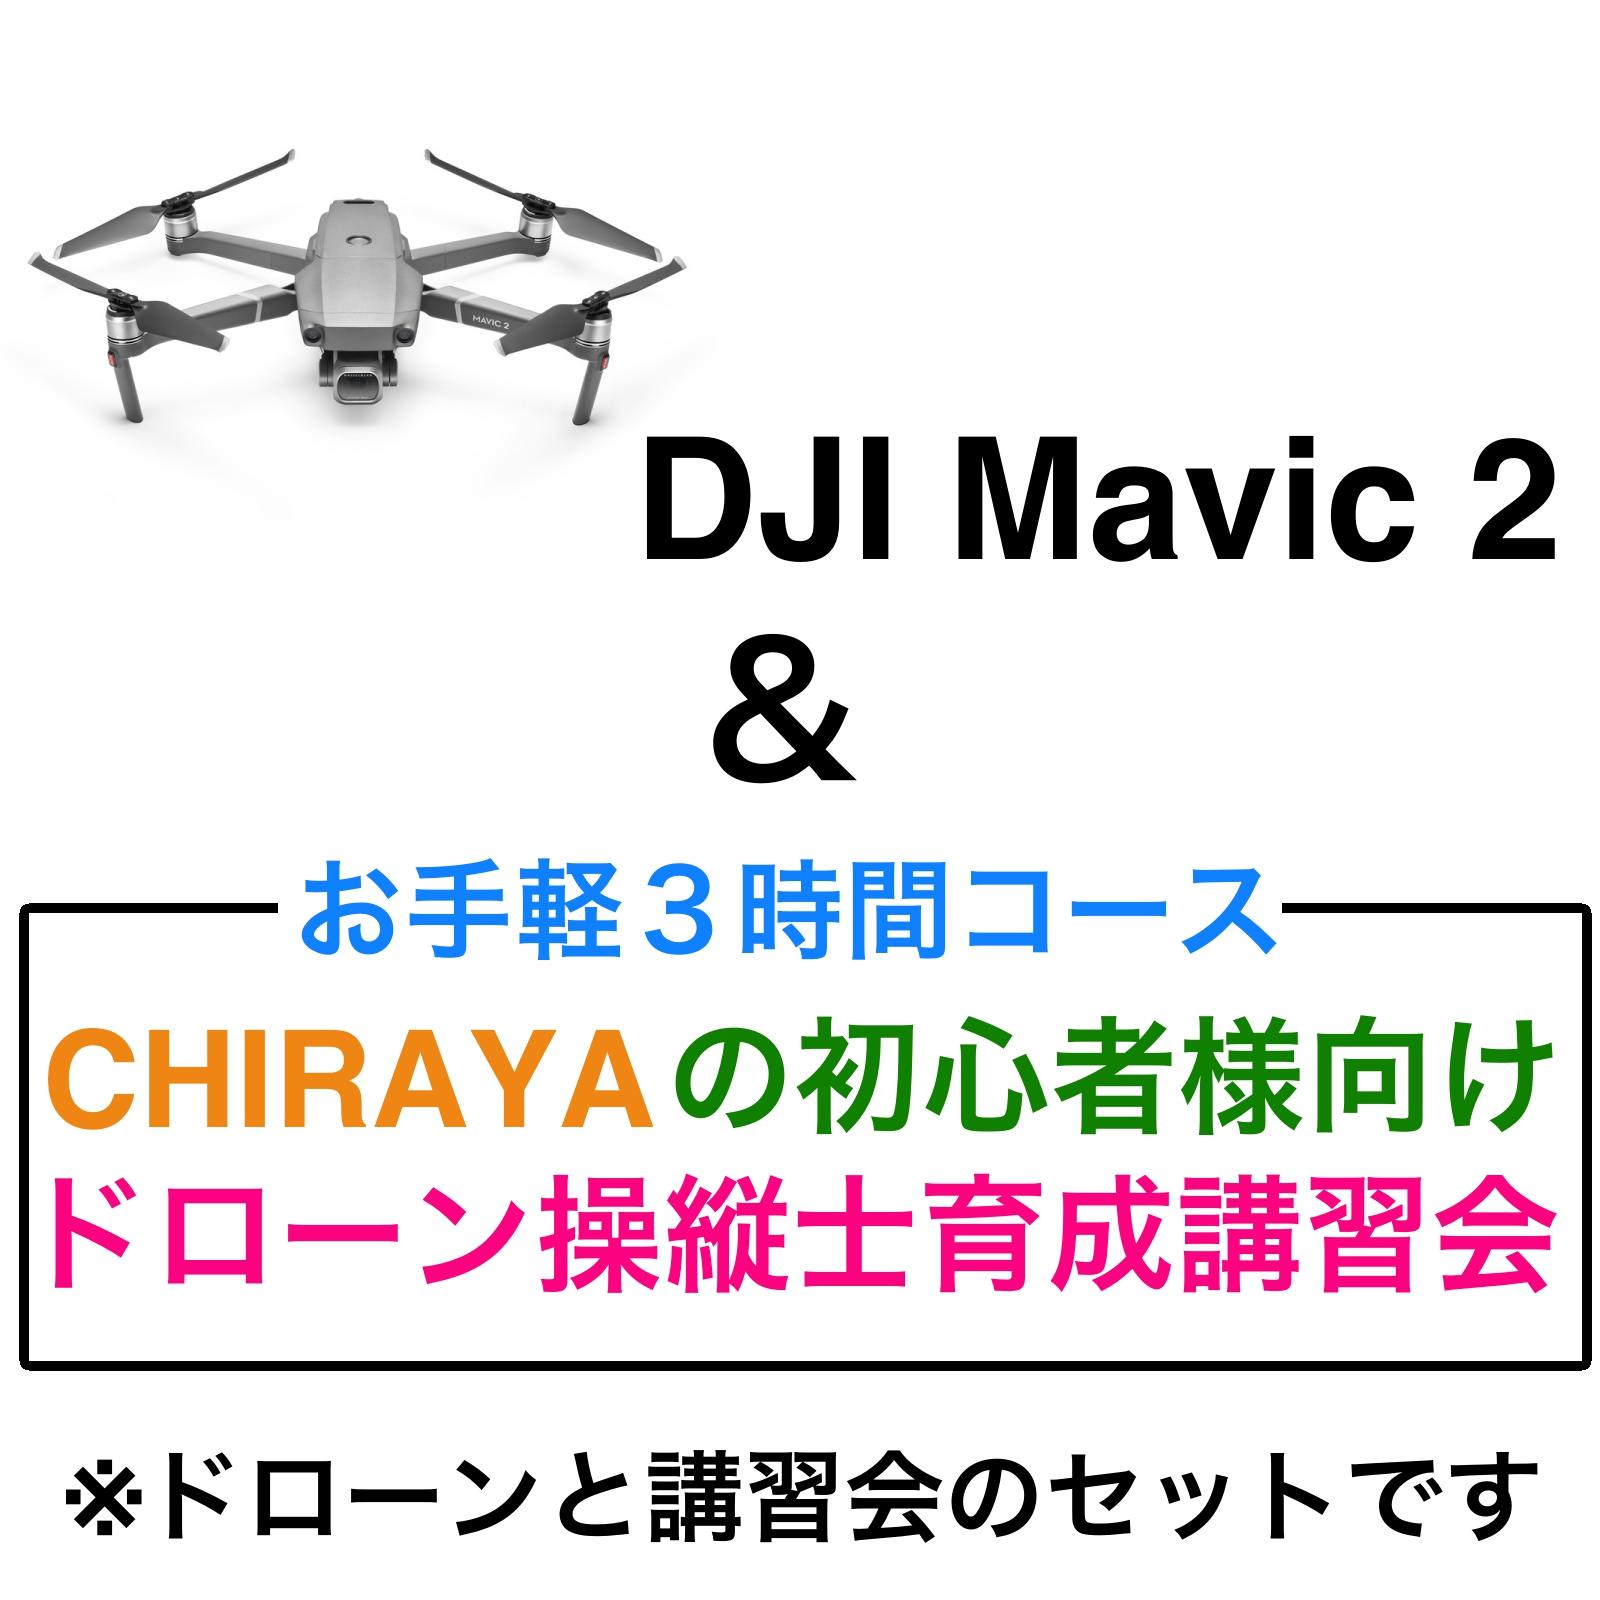 DJI Mavic 2 Pro + Fly More キット&【個別レッスン 3時間コース】CHRAYAの初心者様向けドローン操縦士育成講習会セット